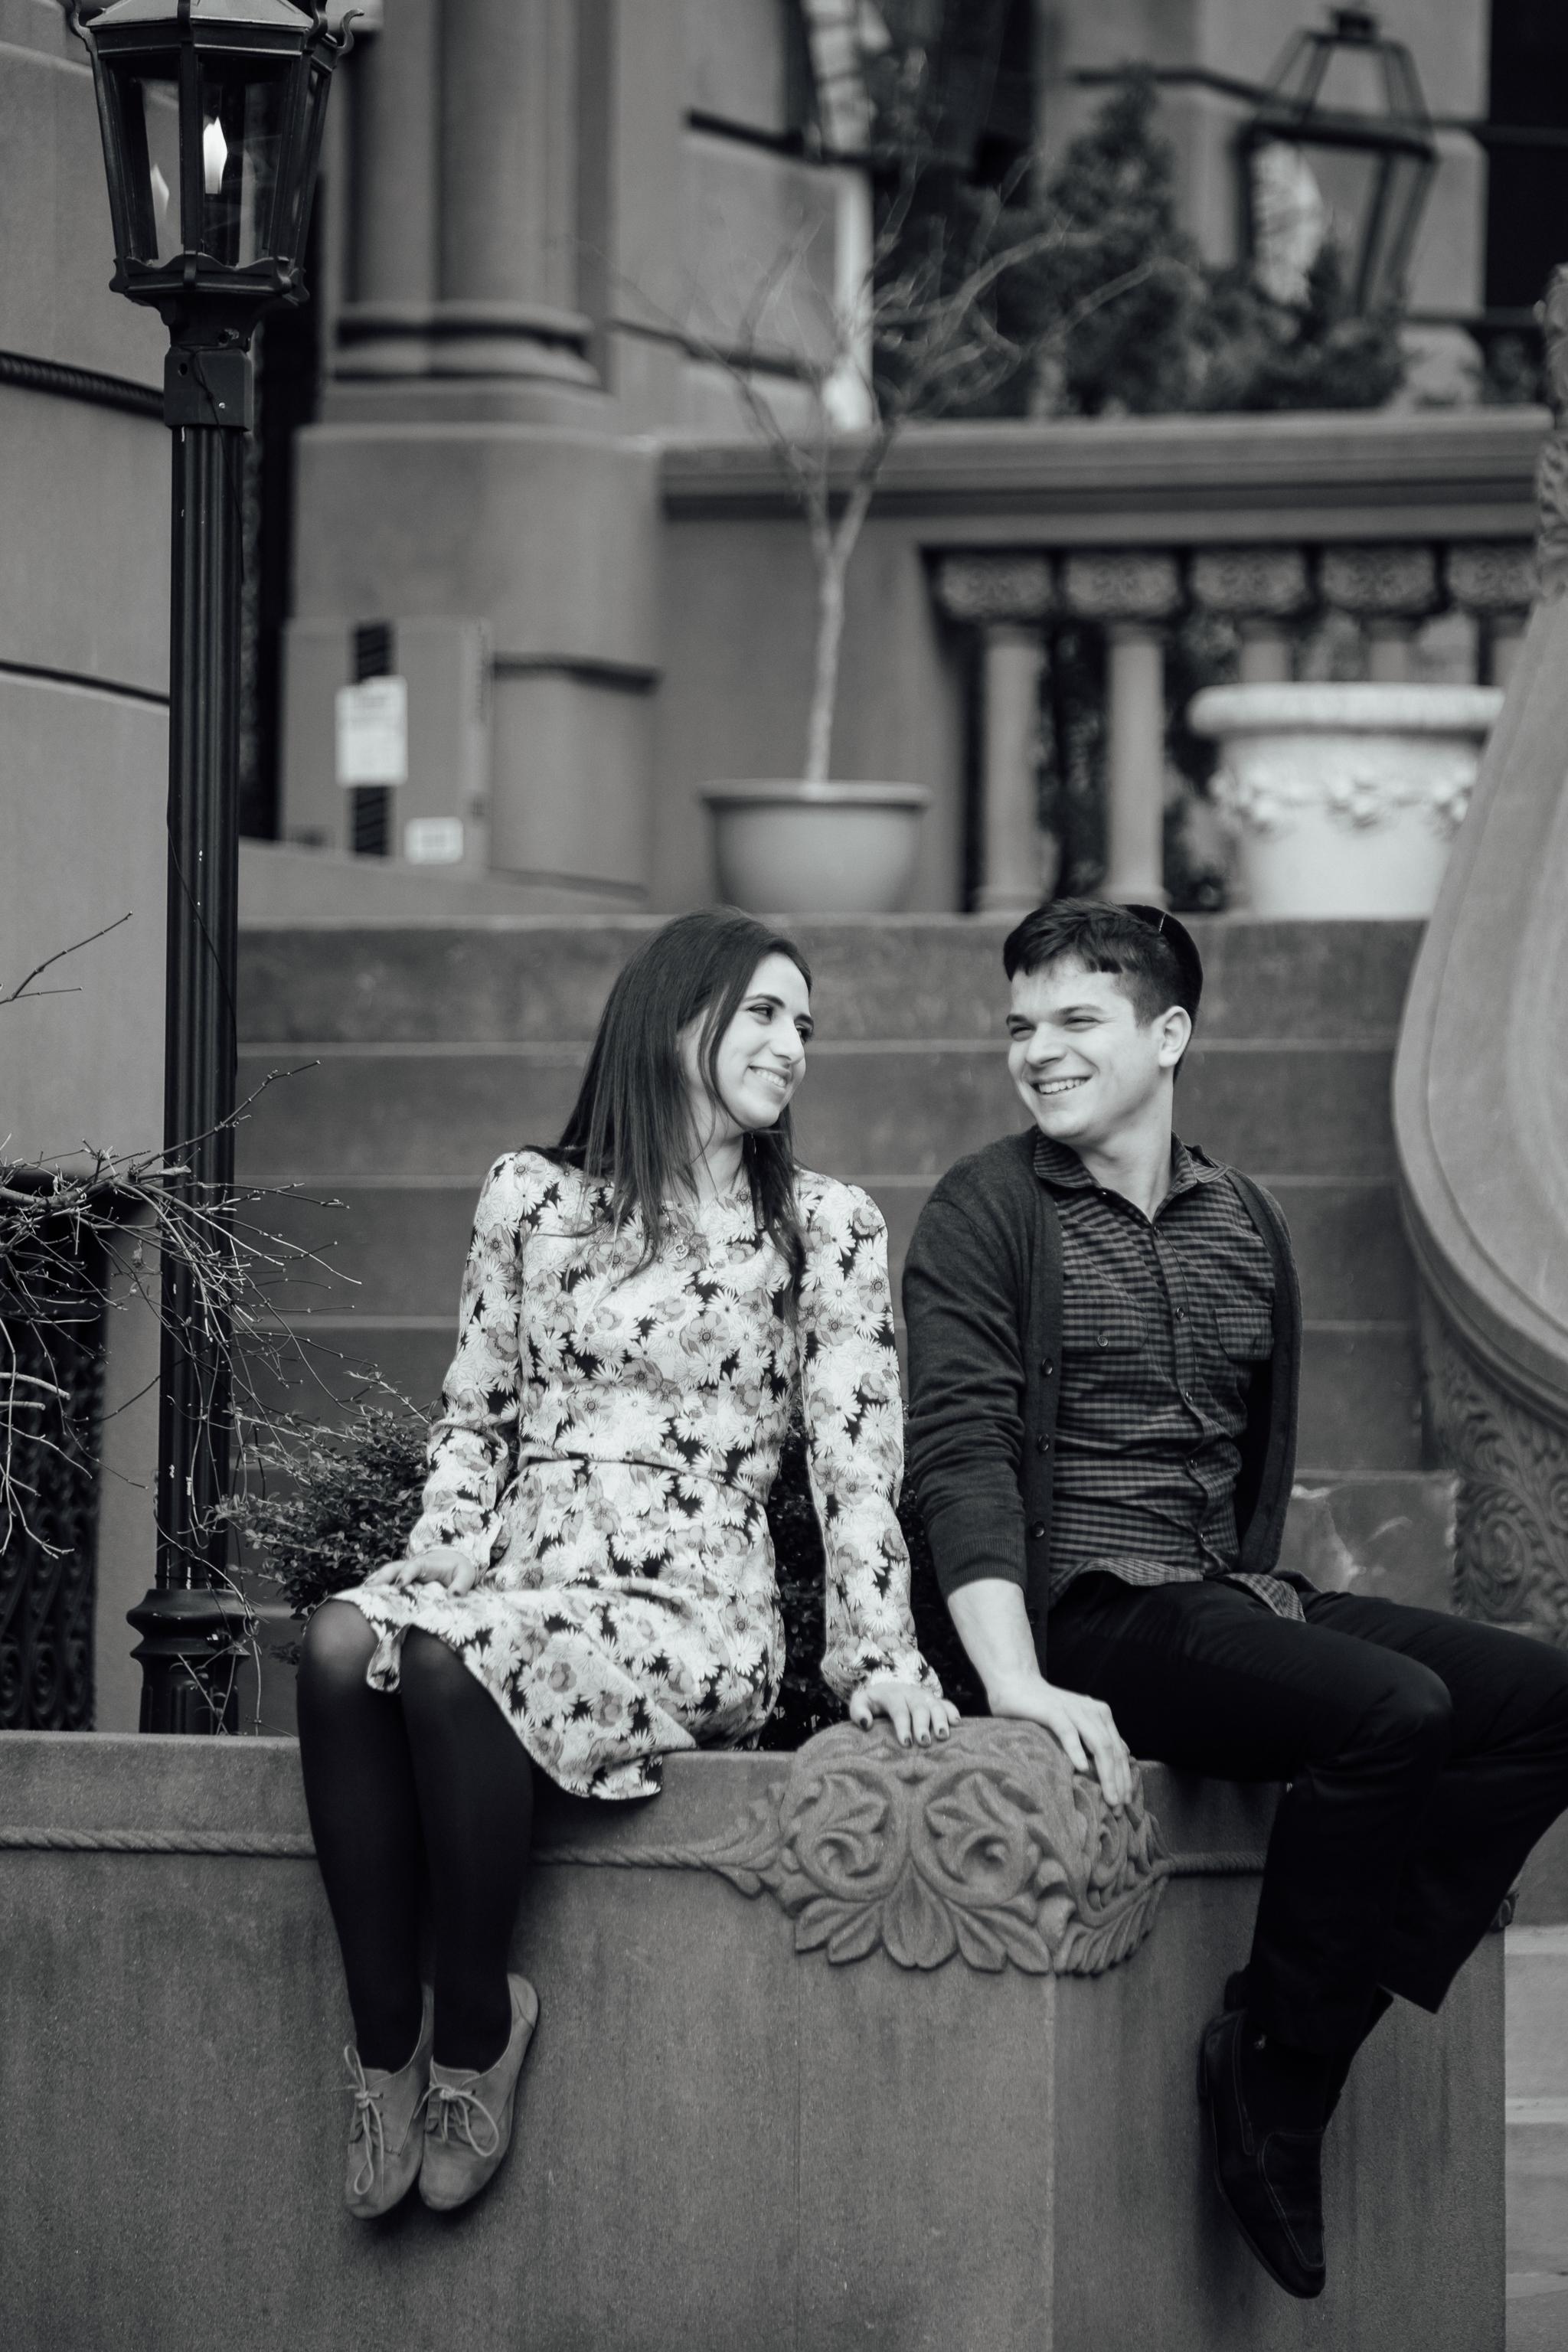 Avi & Yehudis - Engagement Session  - Eliau Piha studio photography, new york, events, people-0070.jpg